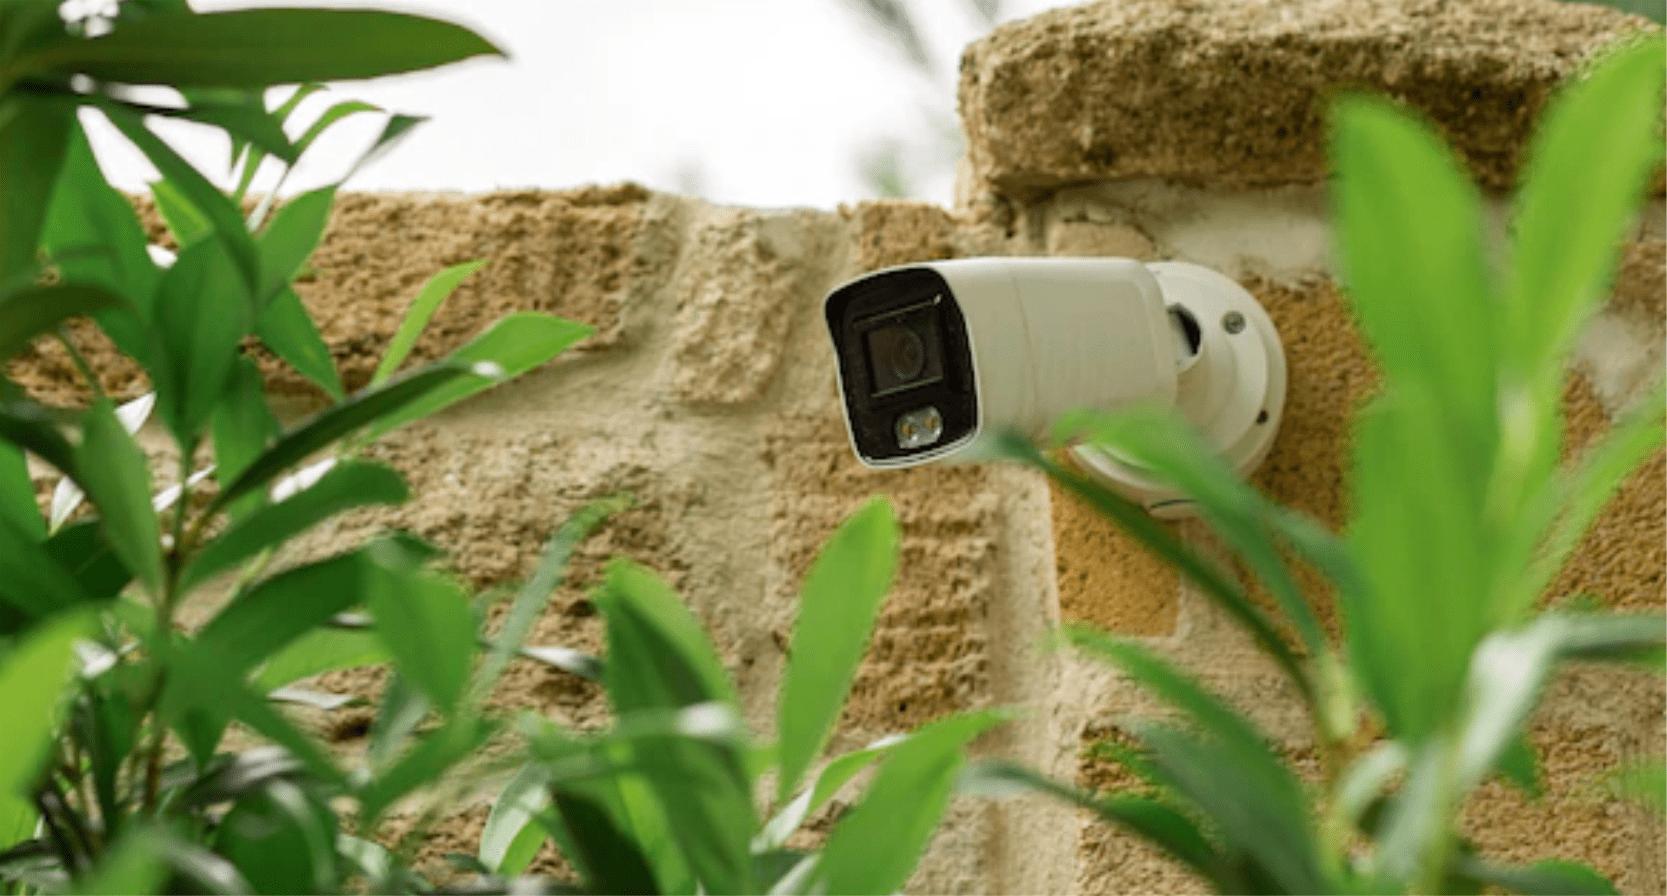 https://solavtec.com/wp-content/uploads/2015/12/campo_futbol.png